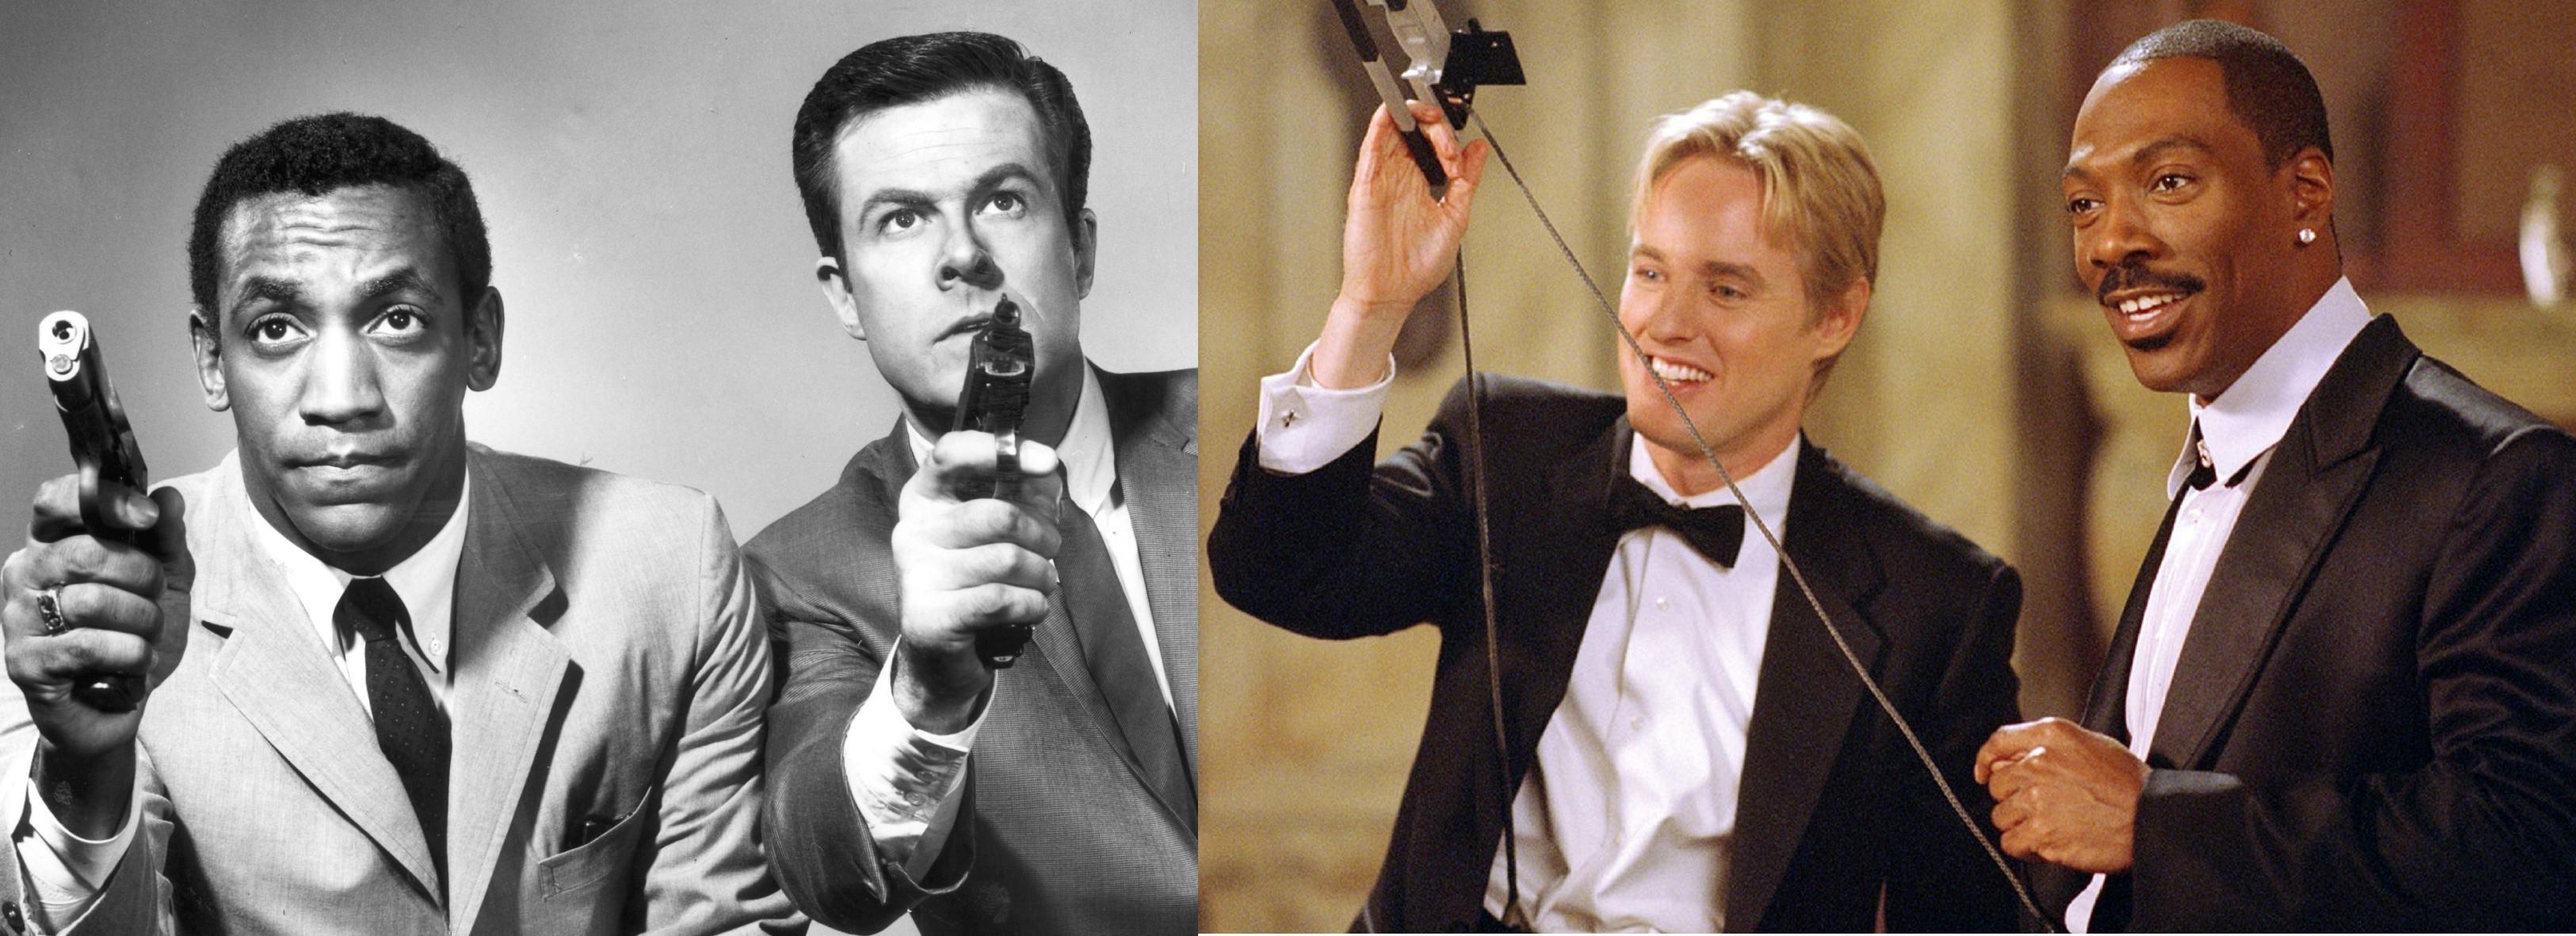 Bill Cosby and Robert Culp (1965-8); Owen Wilson and Eddie Murphy in I Spy(2002)